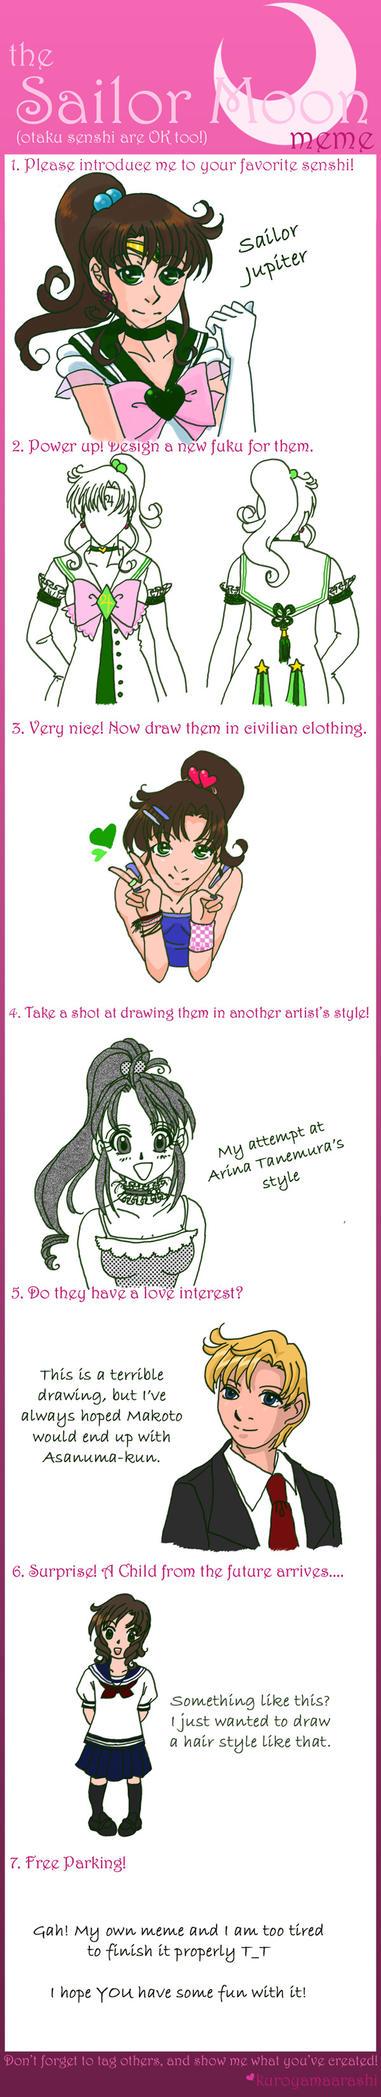 Sailor Moon meme - Jupiter by skelly-jelly